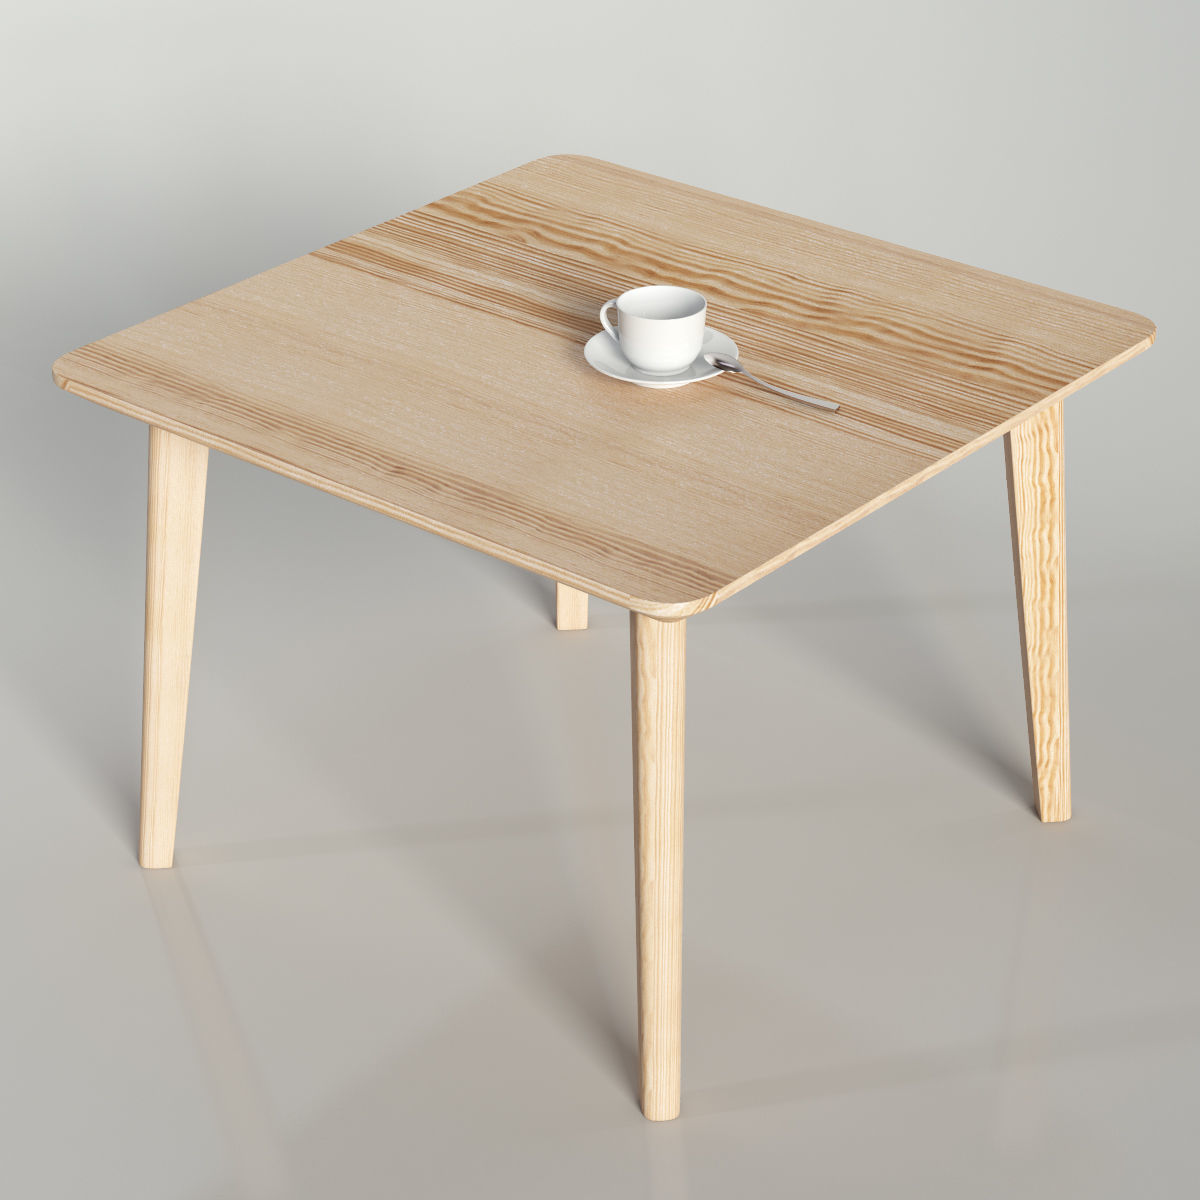 3d Model Ikea Lisabo Coffe Table 70cm Cgtrader